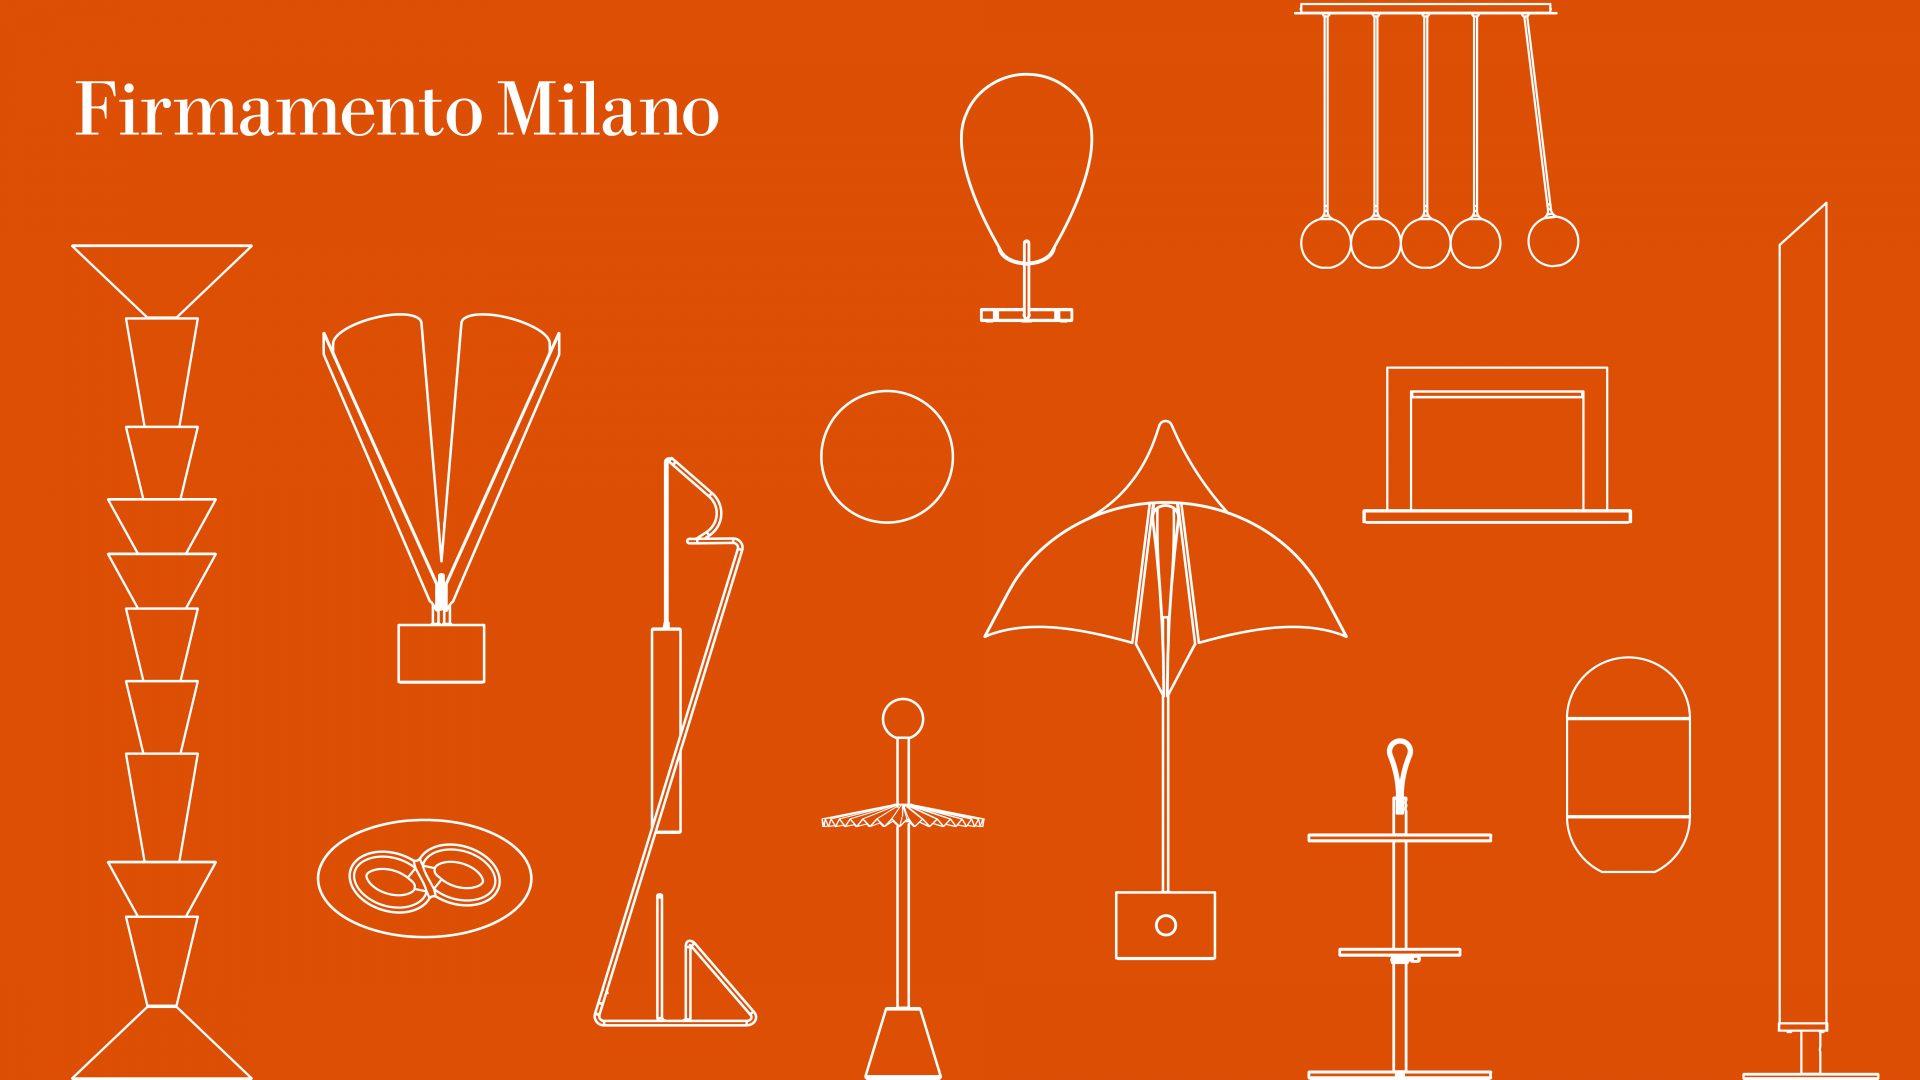 Firmamento Milano